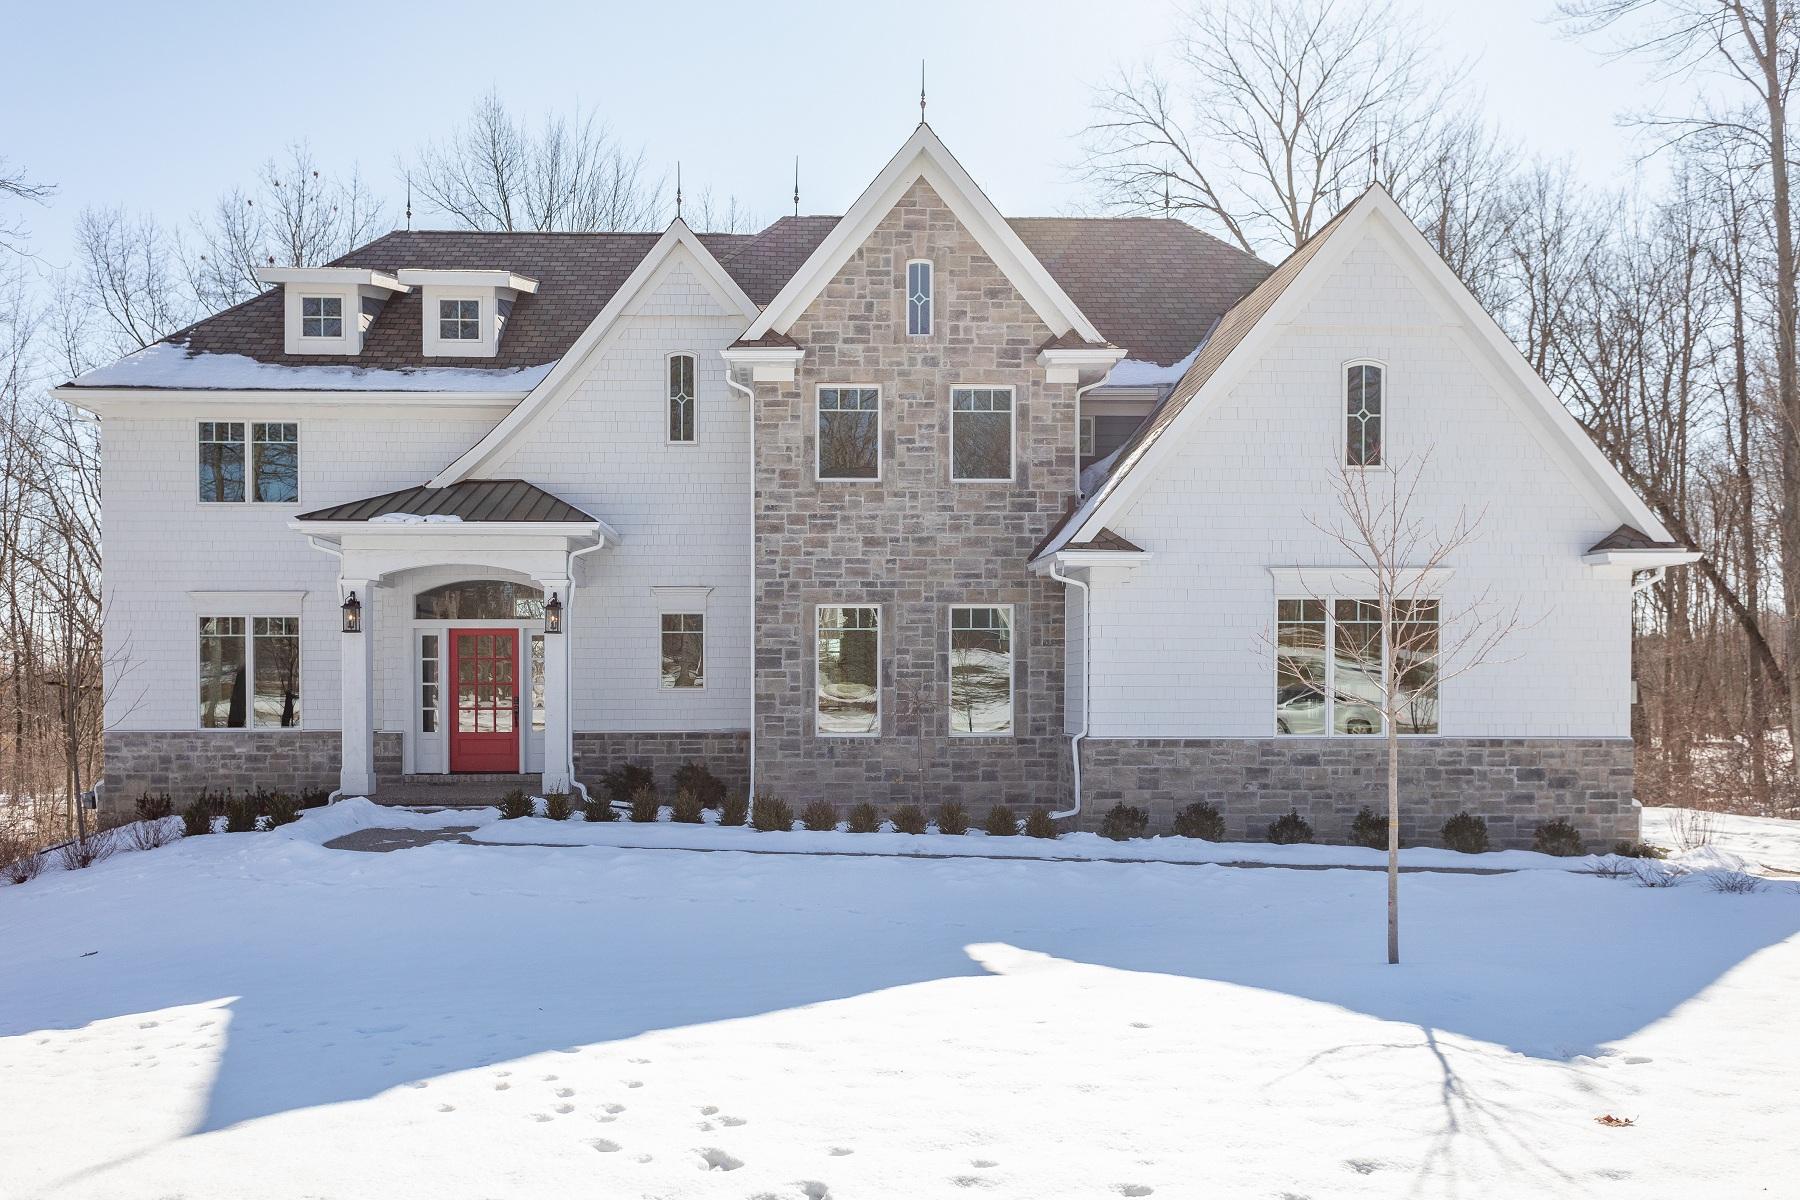 Single Family Homes for Sale at Clarkston 7525 Maple Ridge Drive Clarkston, Michigan 48346 United States